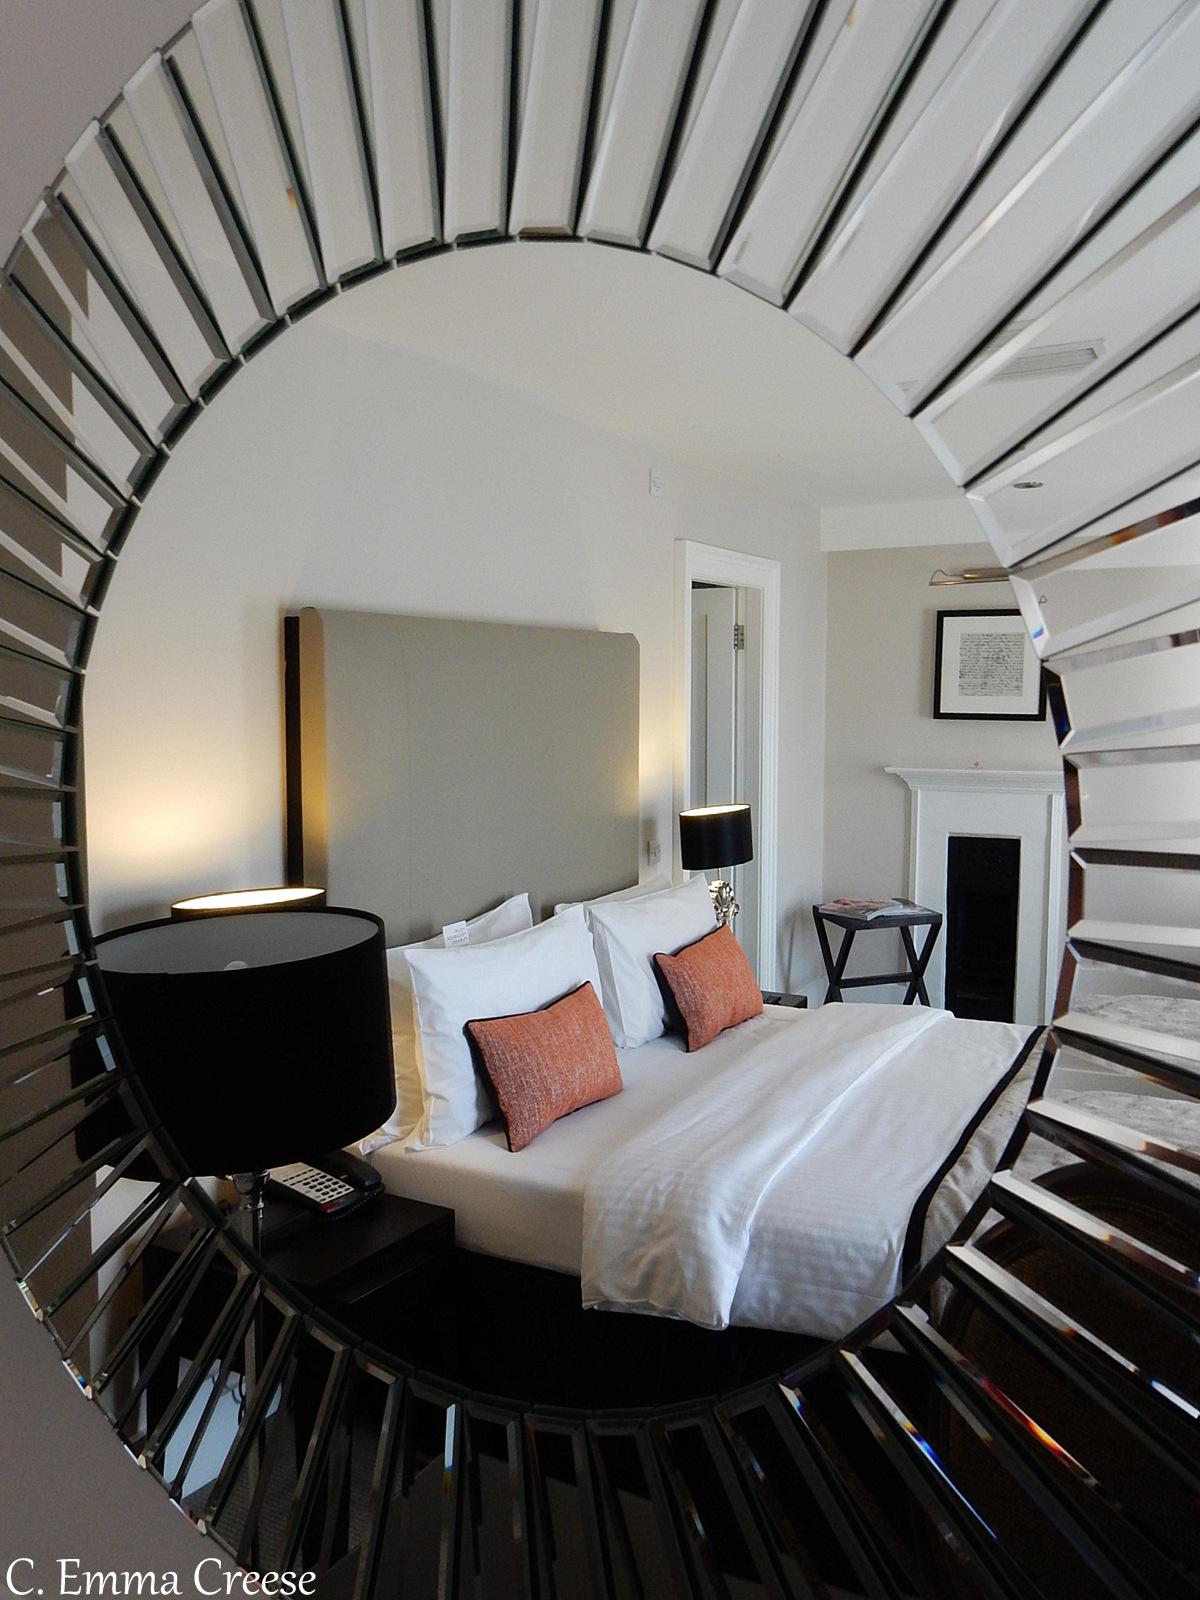 Marylebone Staycation Adventures of a London Kiwi